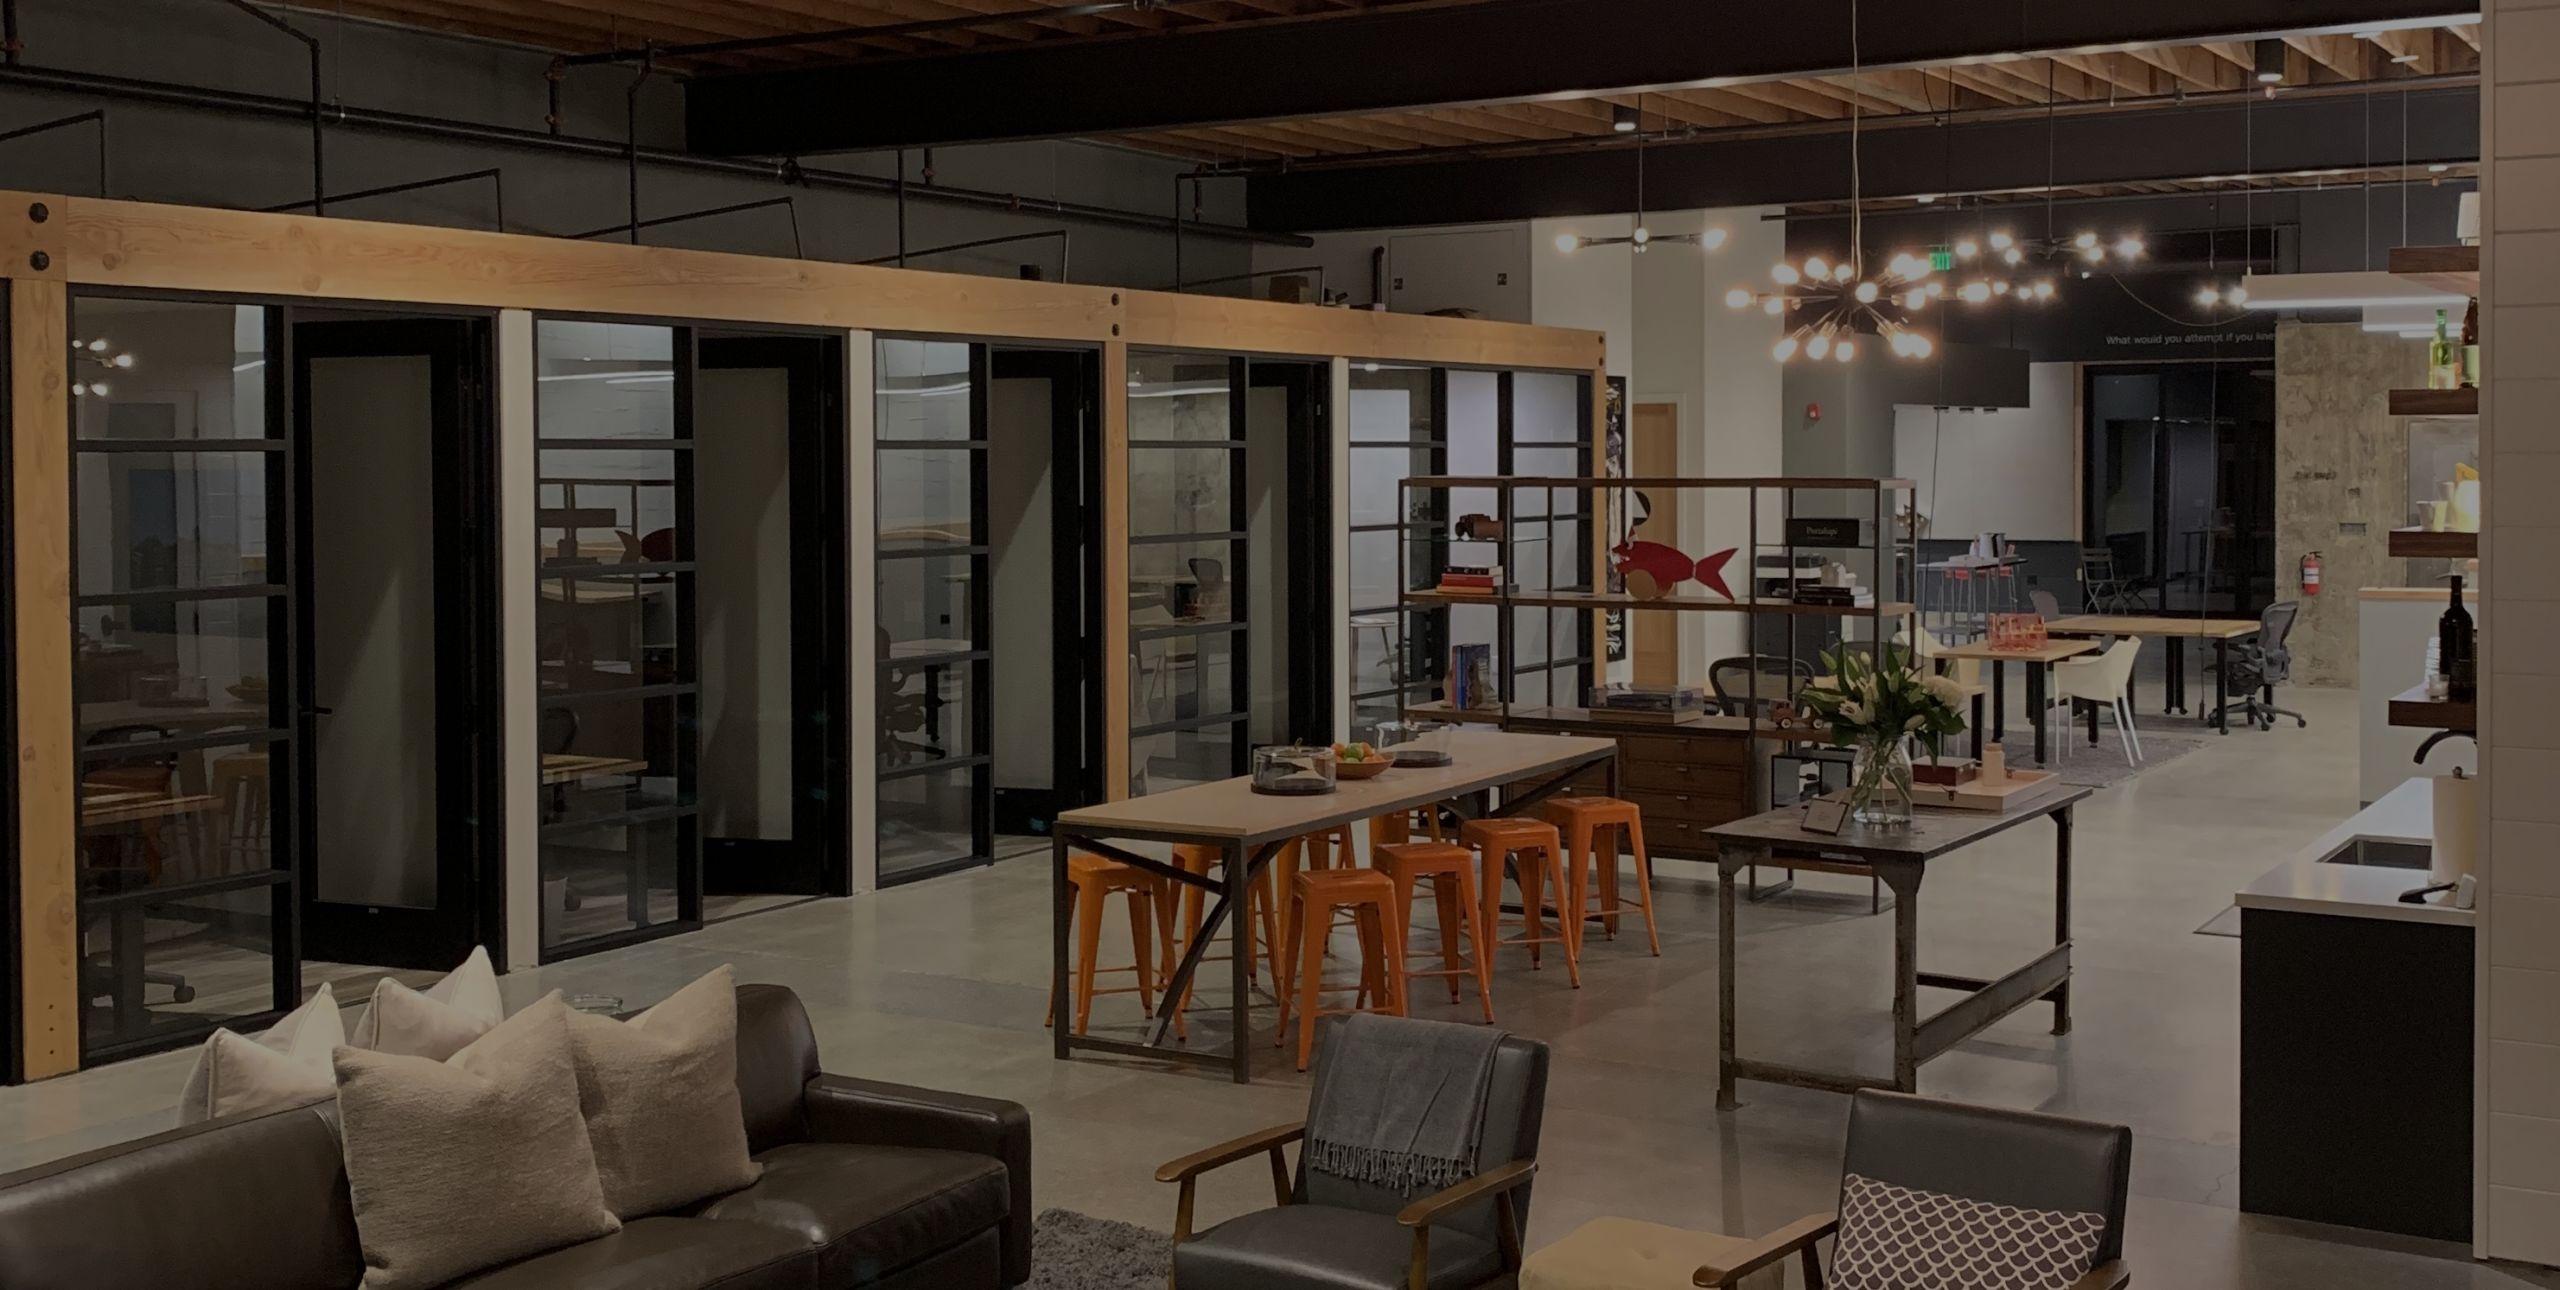 Healdsburg's New Work Space, CraftWork, Takes Off